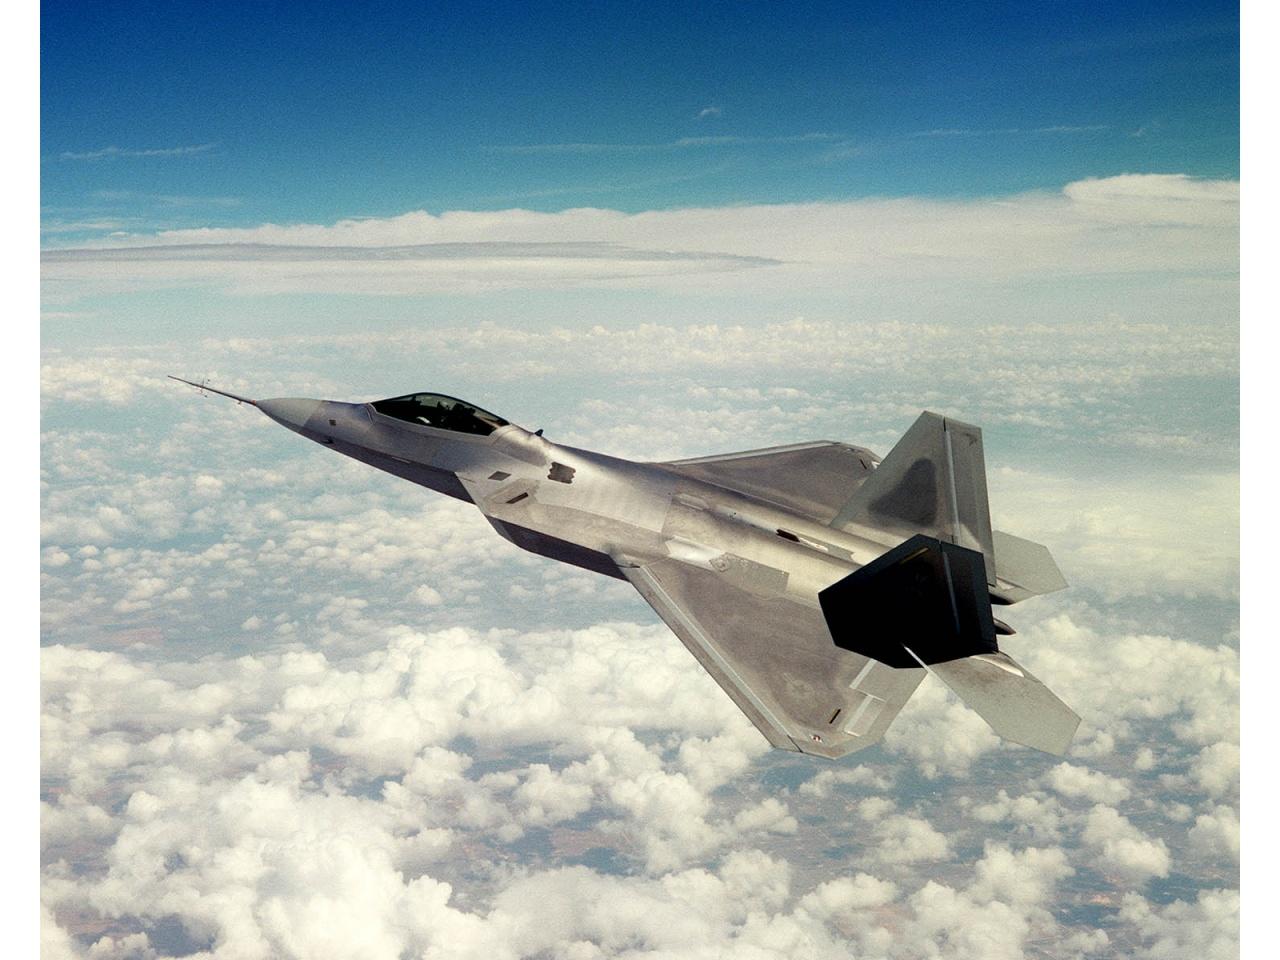 Boeing F 22 Raptor Wallpapers   1280x960   386272 1280x960